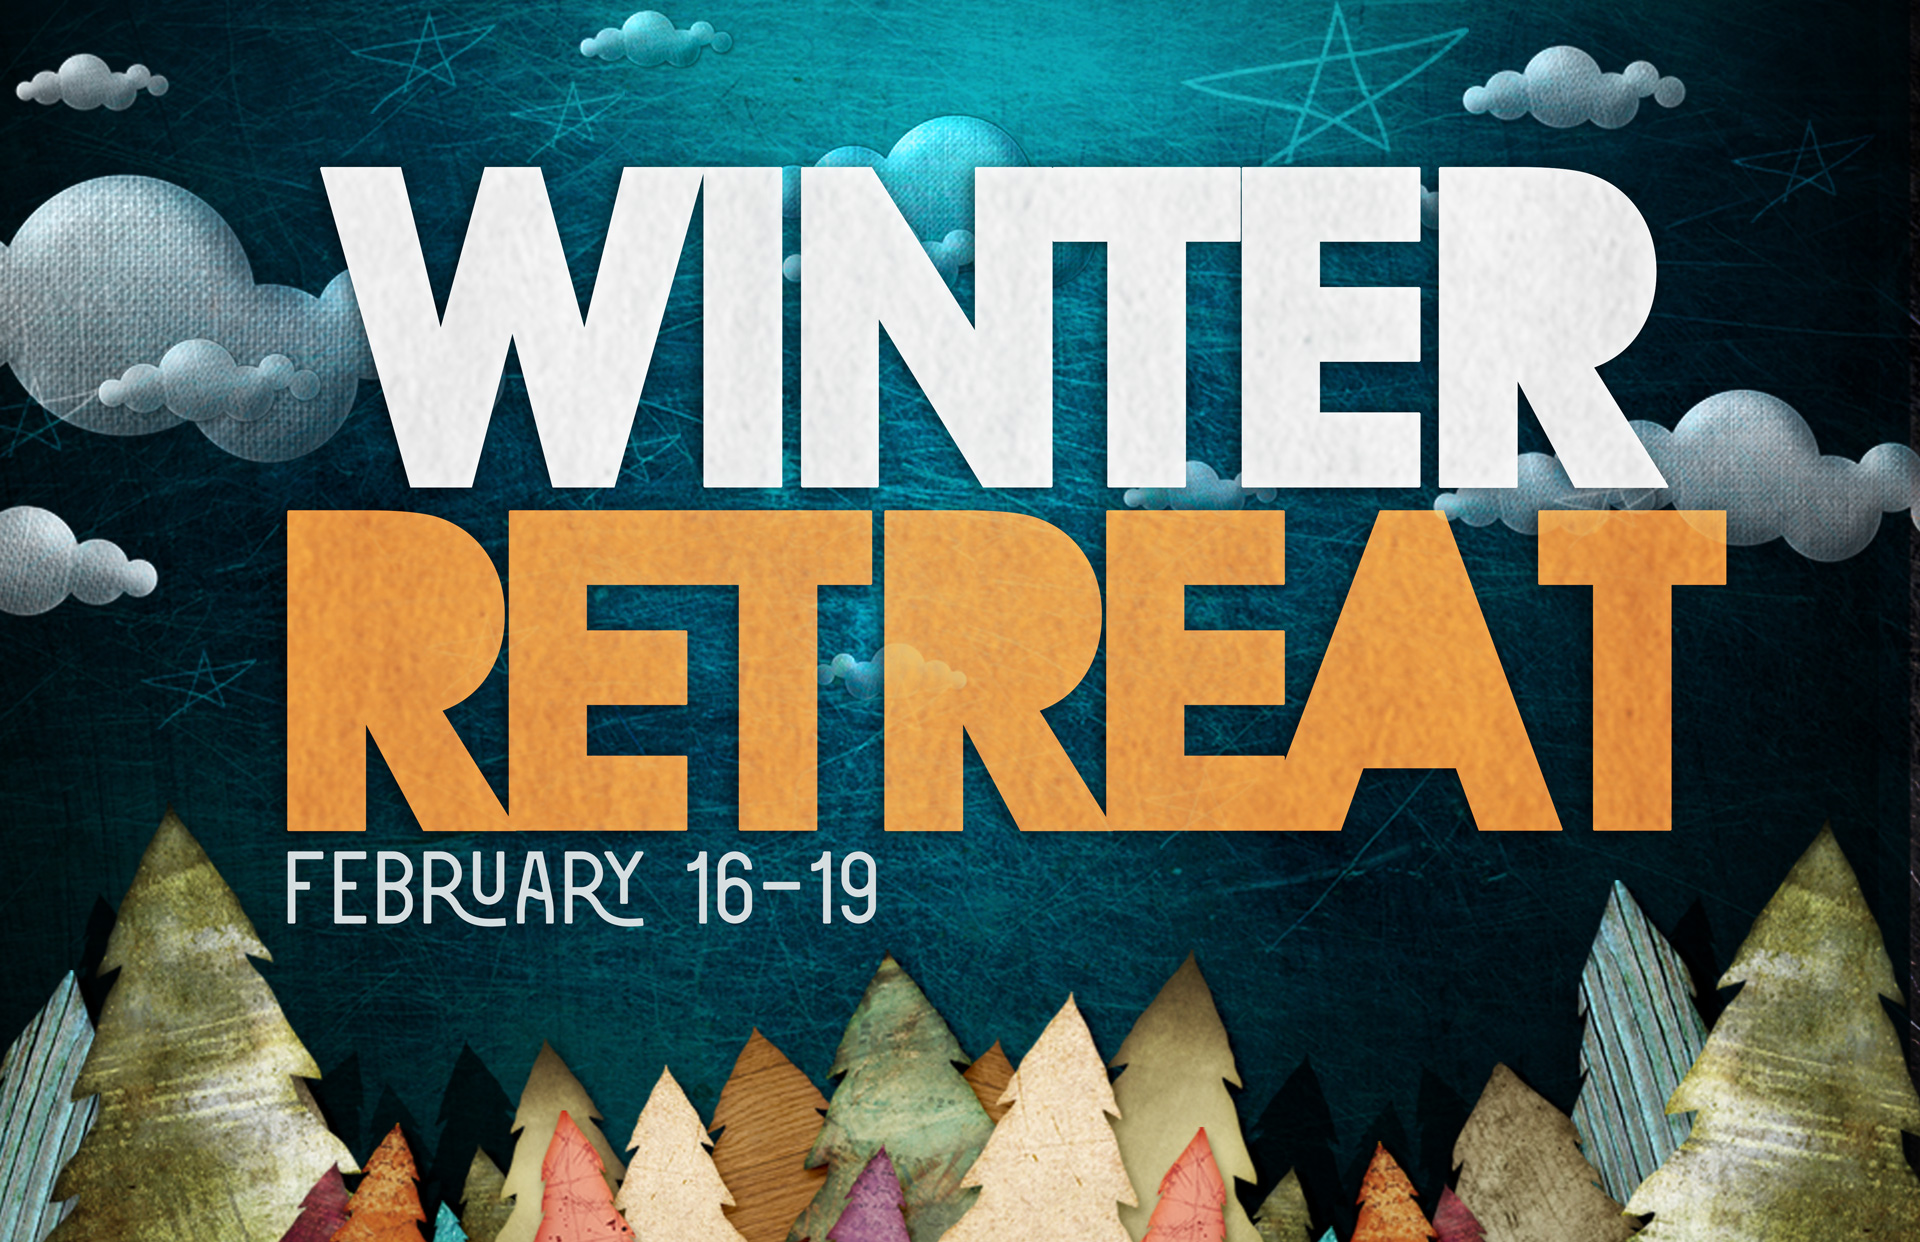 Winterretreat poster 2018